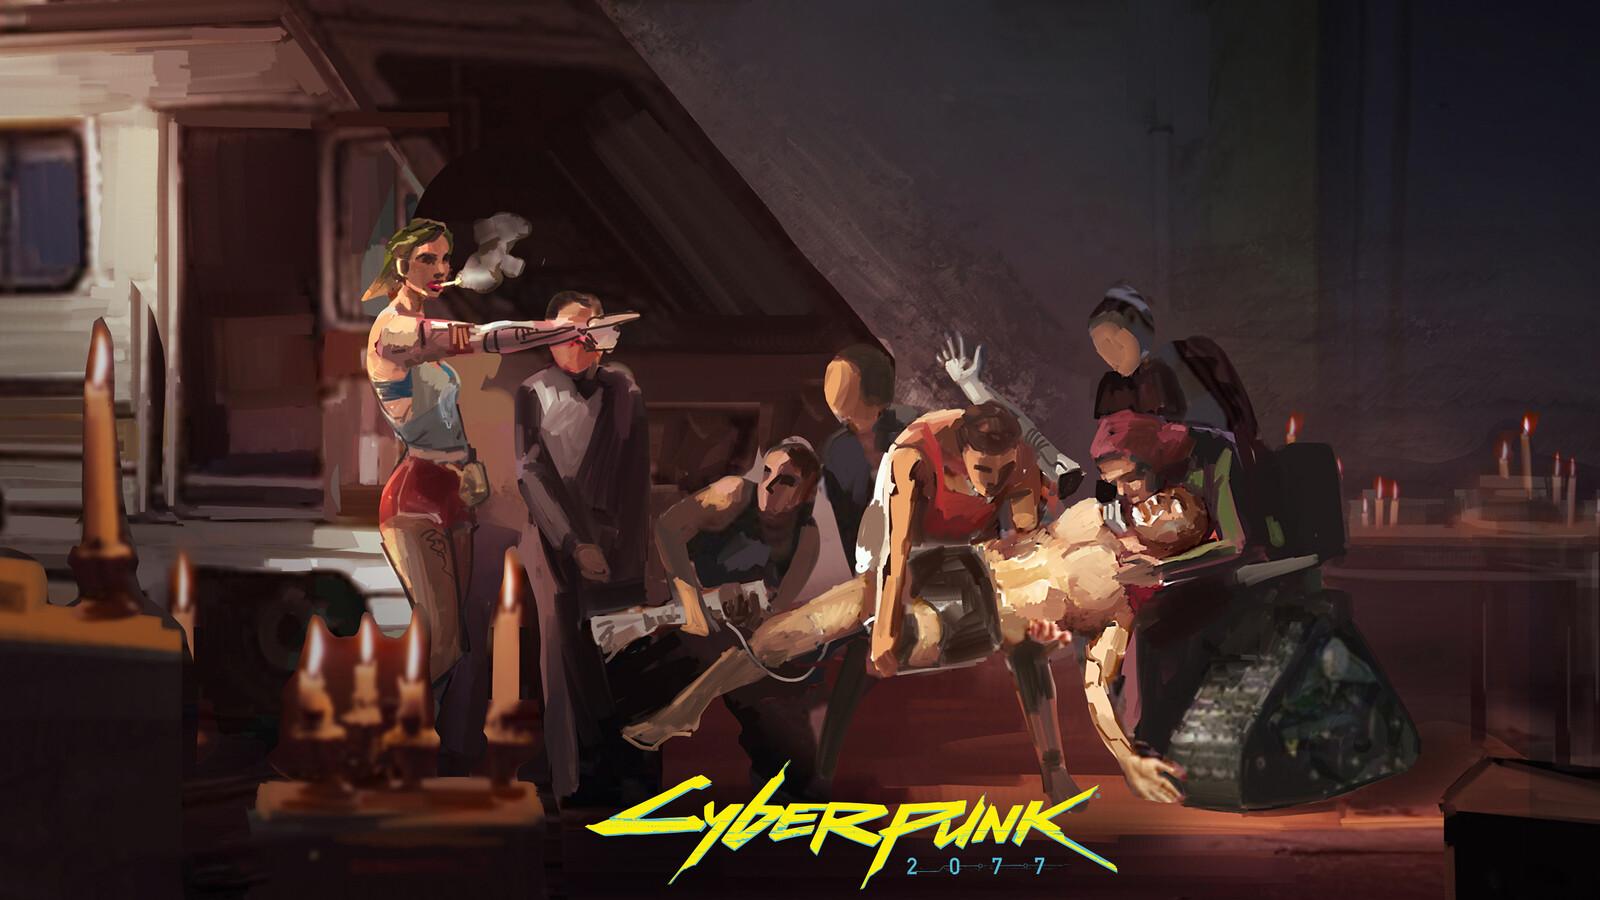 Cyberpunk 2077 - Cyber Christ